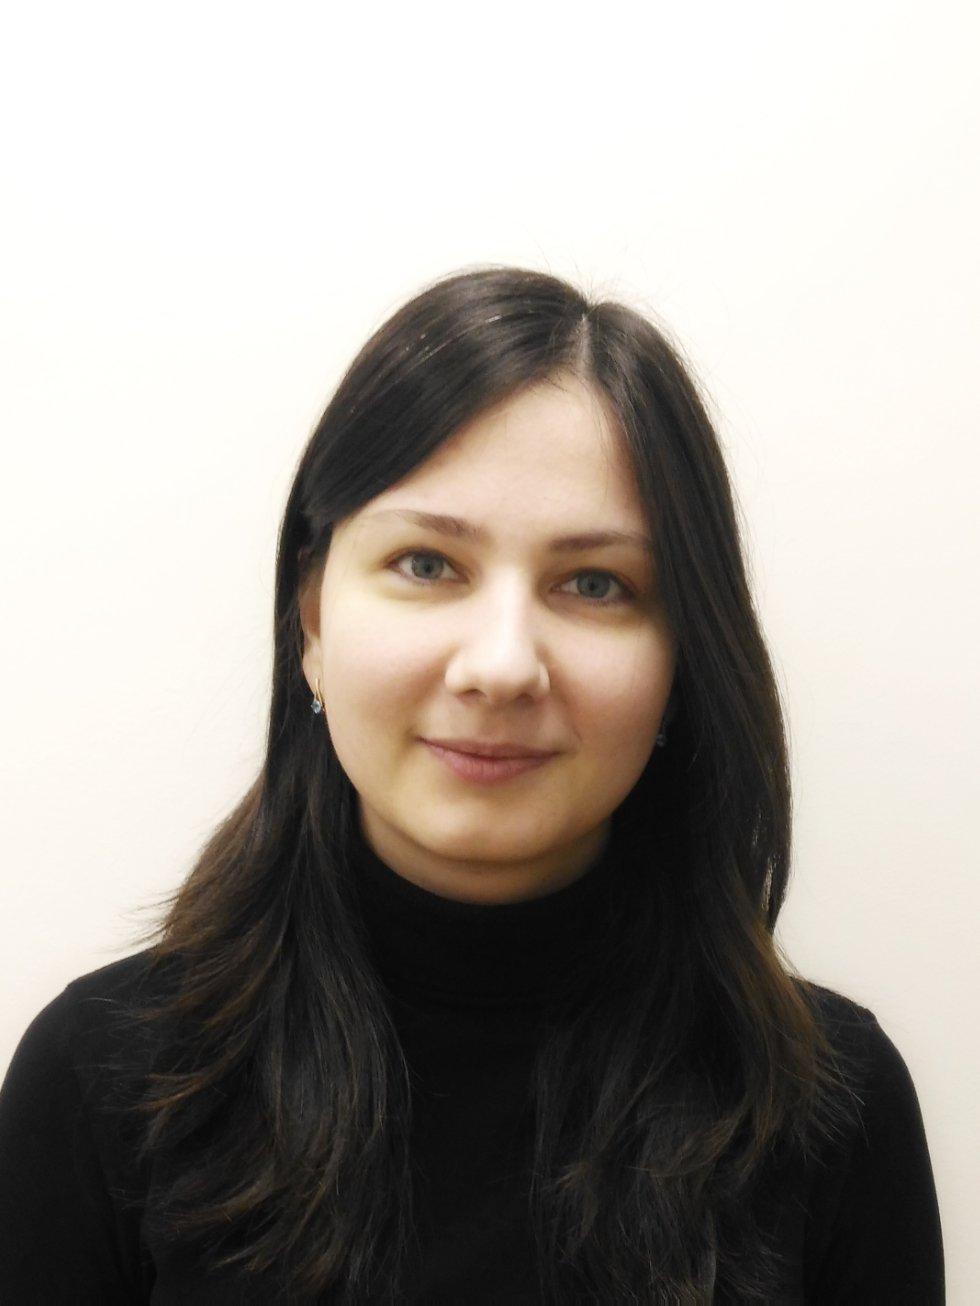 Siniagina Maria Nikolaevna